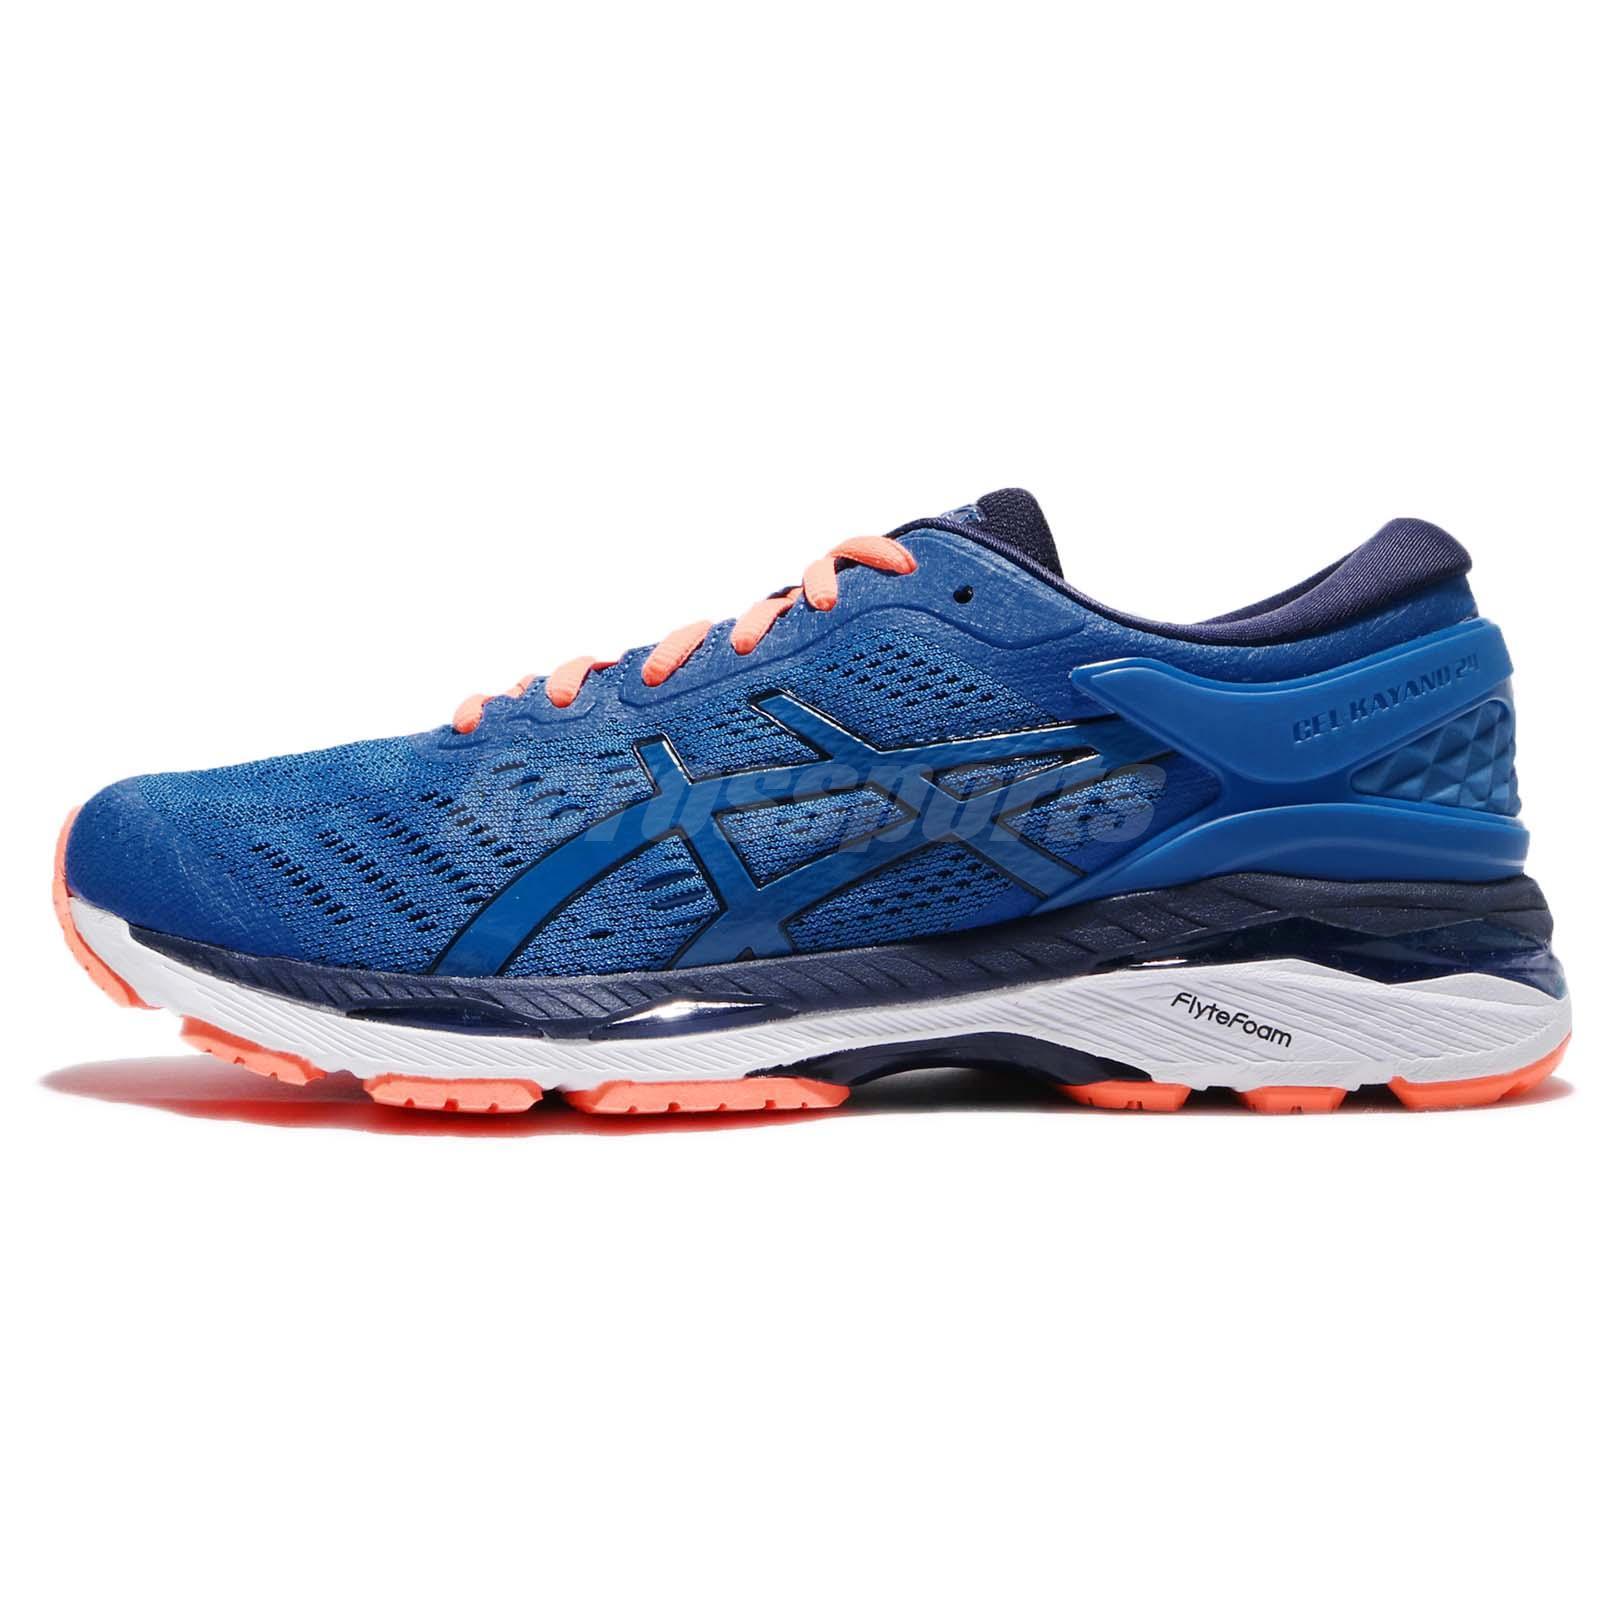 1ce255412752 Asics Gel-Kayano 24 Directoire Blue Hot Orange Men Running Shoes T749N-4358